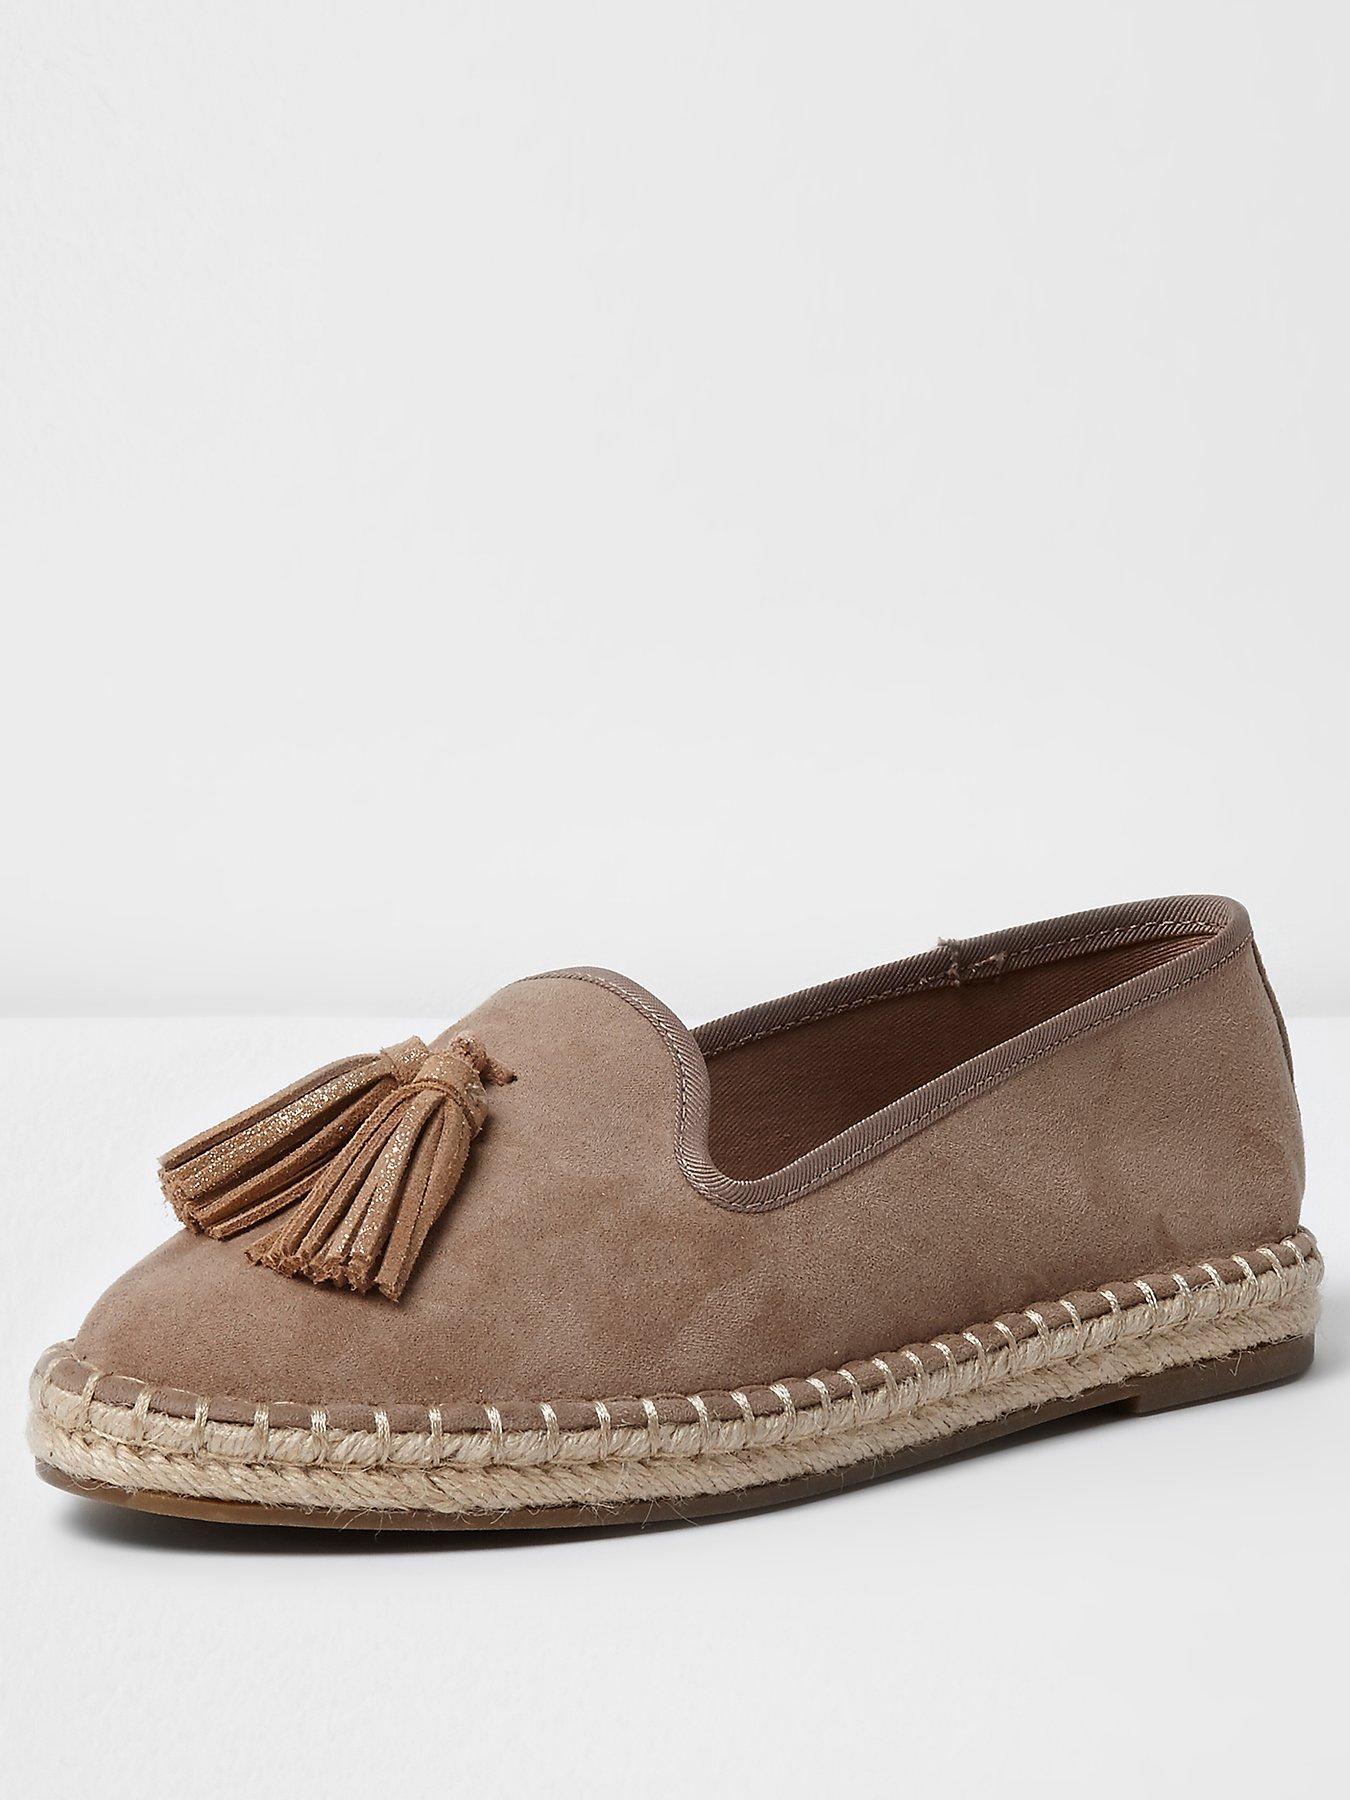 River Island Espadrille Shoe